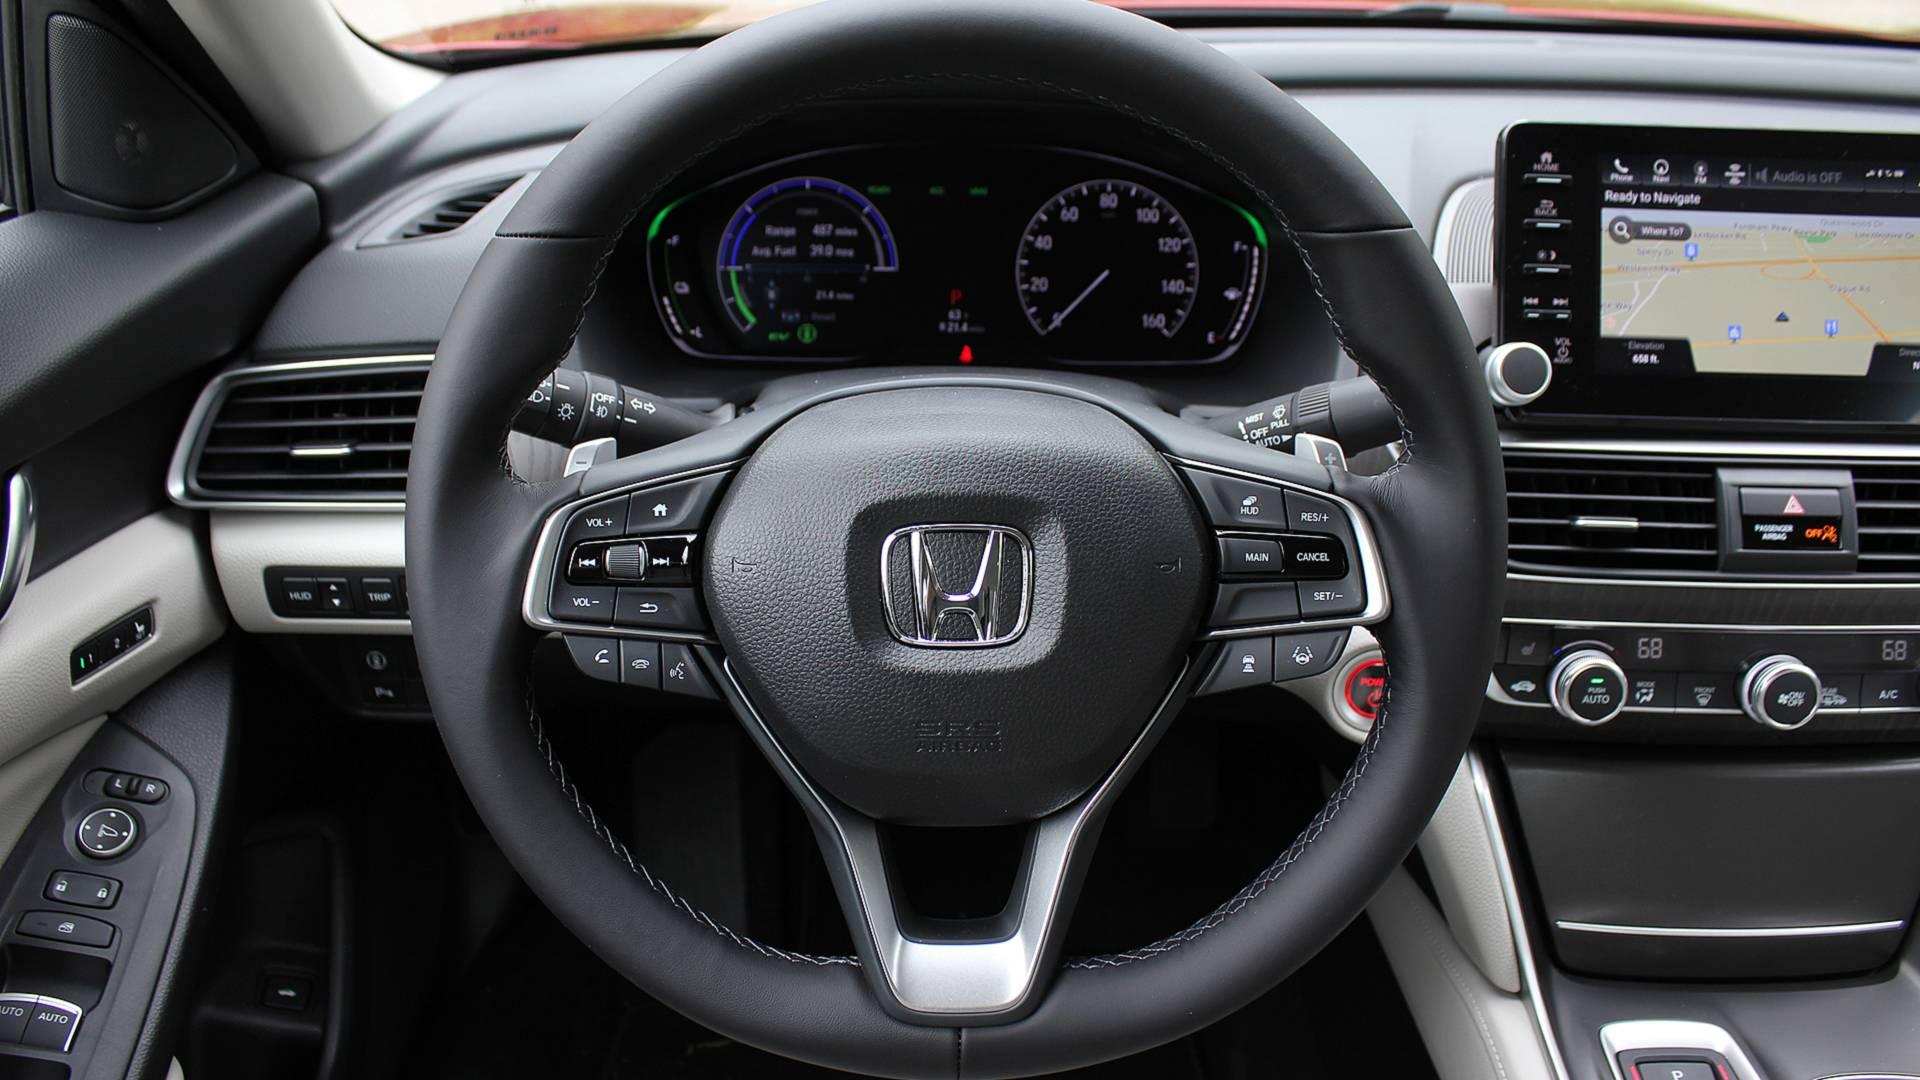 2018-honda-accord-hybrid-danh-gia-8.jpg